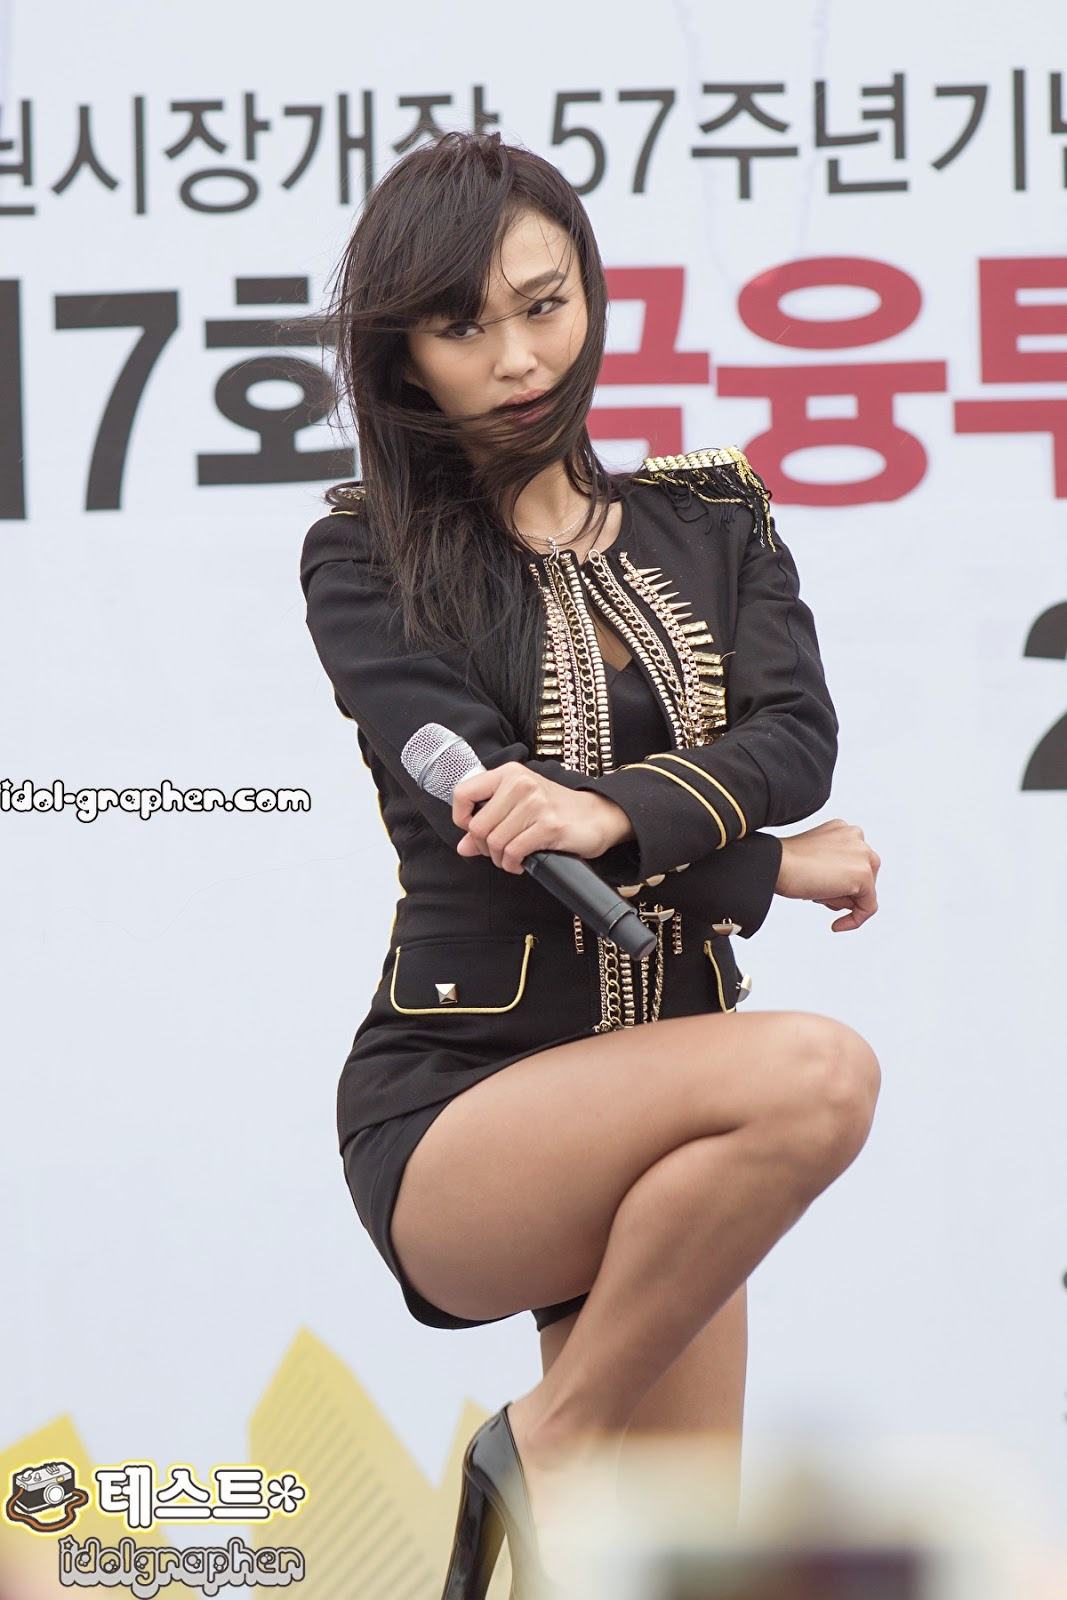 Sistar (씨스타) Hyorin (효린) - Bulls Race on 06 April 2013